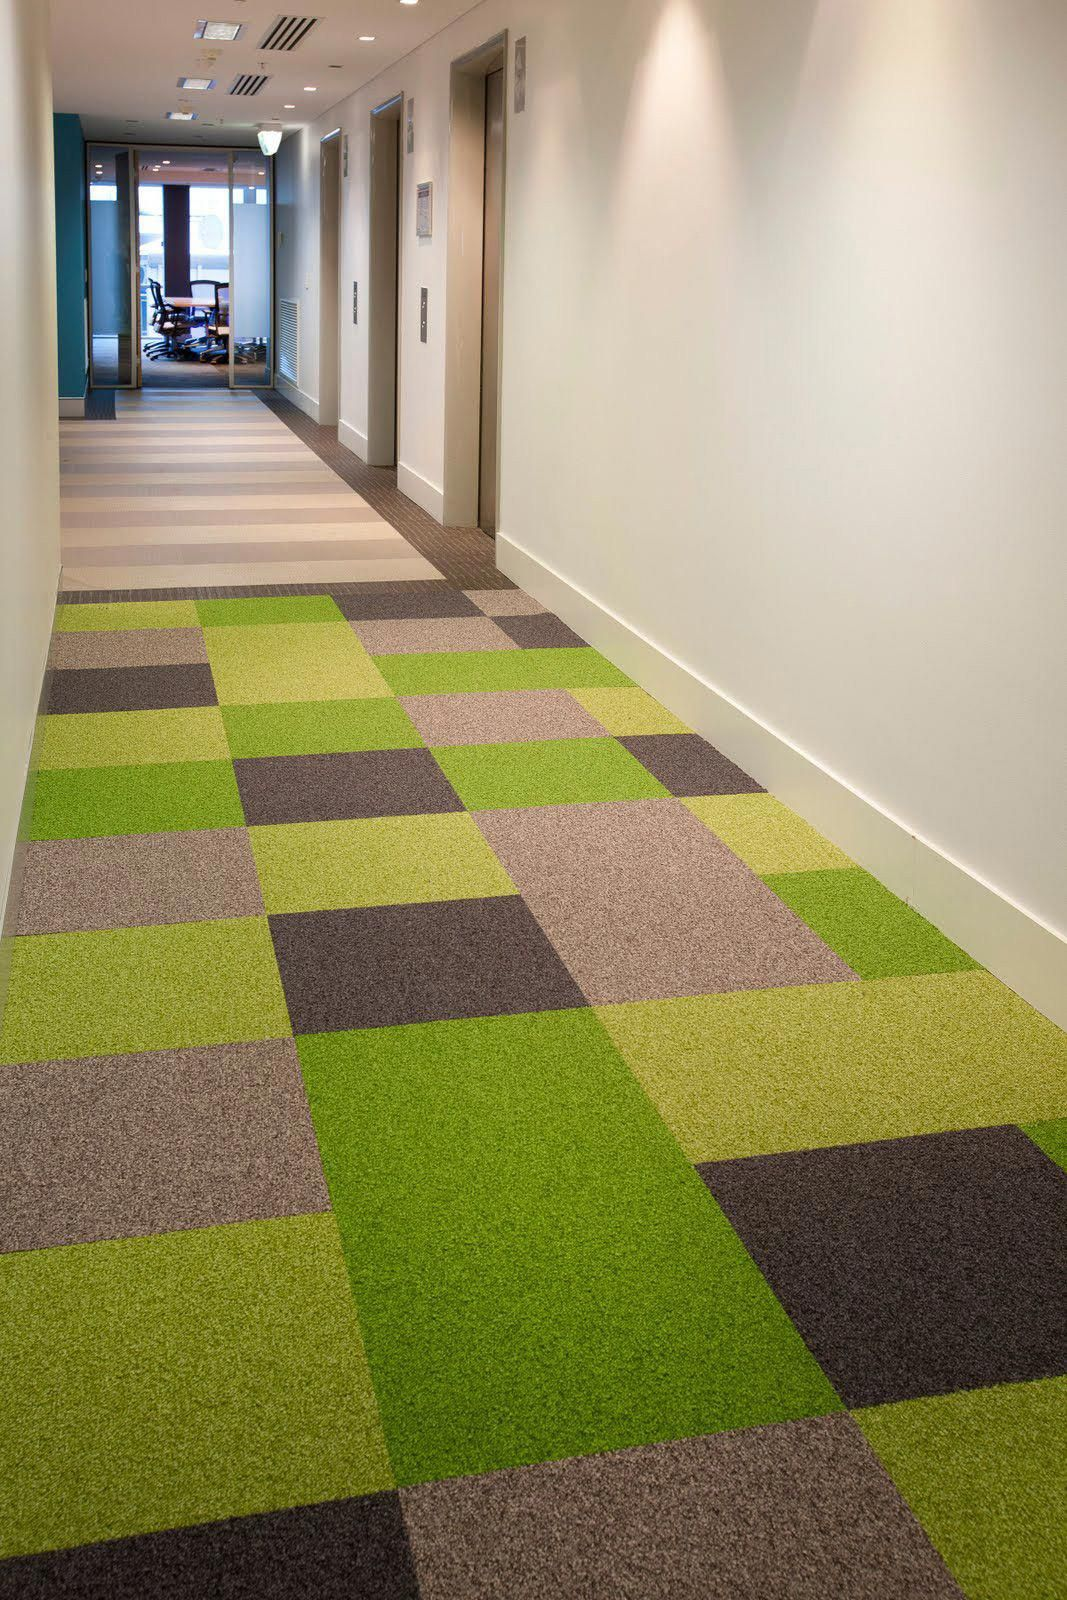 Carpet Runners Northern Ireland Staplesforcarpetrunners Code 3161242405 Carpet Tiles Carpet Tiles Cheap Carpet Tiles Design